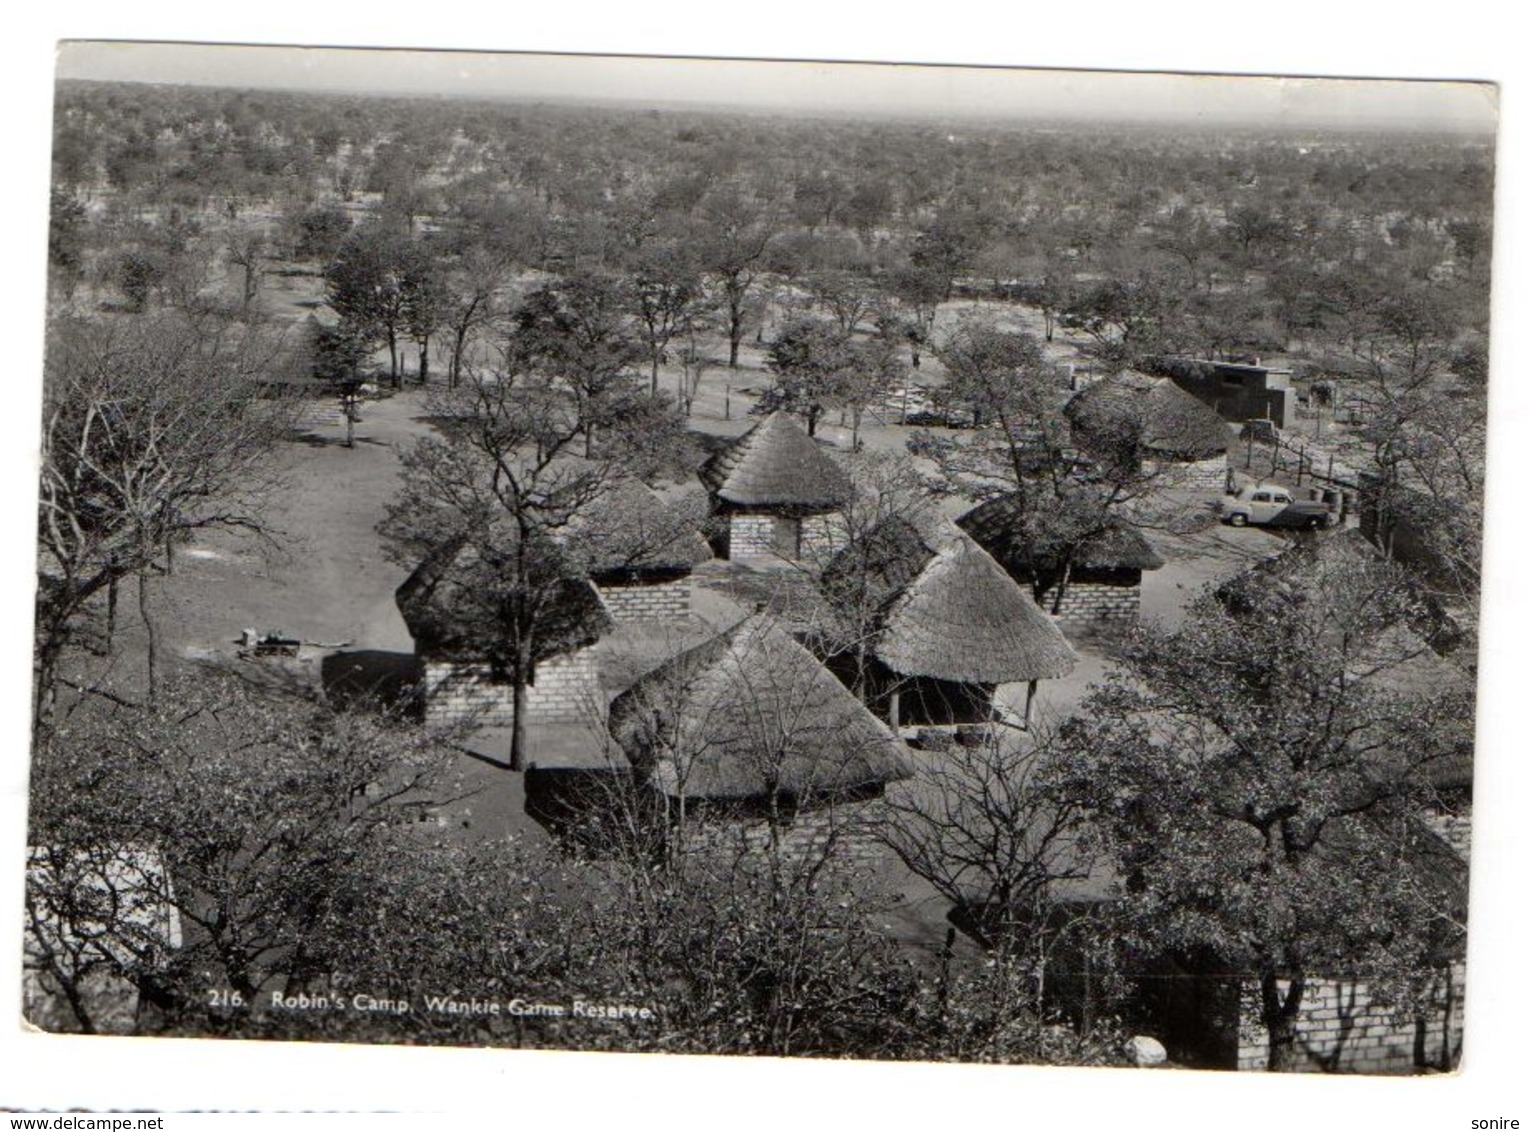 Zimbabwe - Wankie Game Reserve - Robin's Camp - VG FG - C864 - Zimbabwe